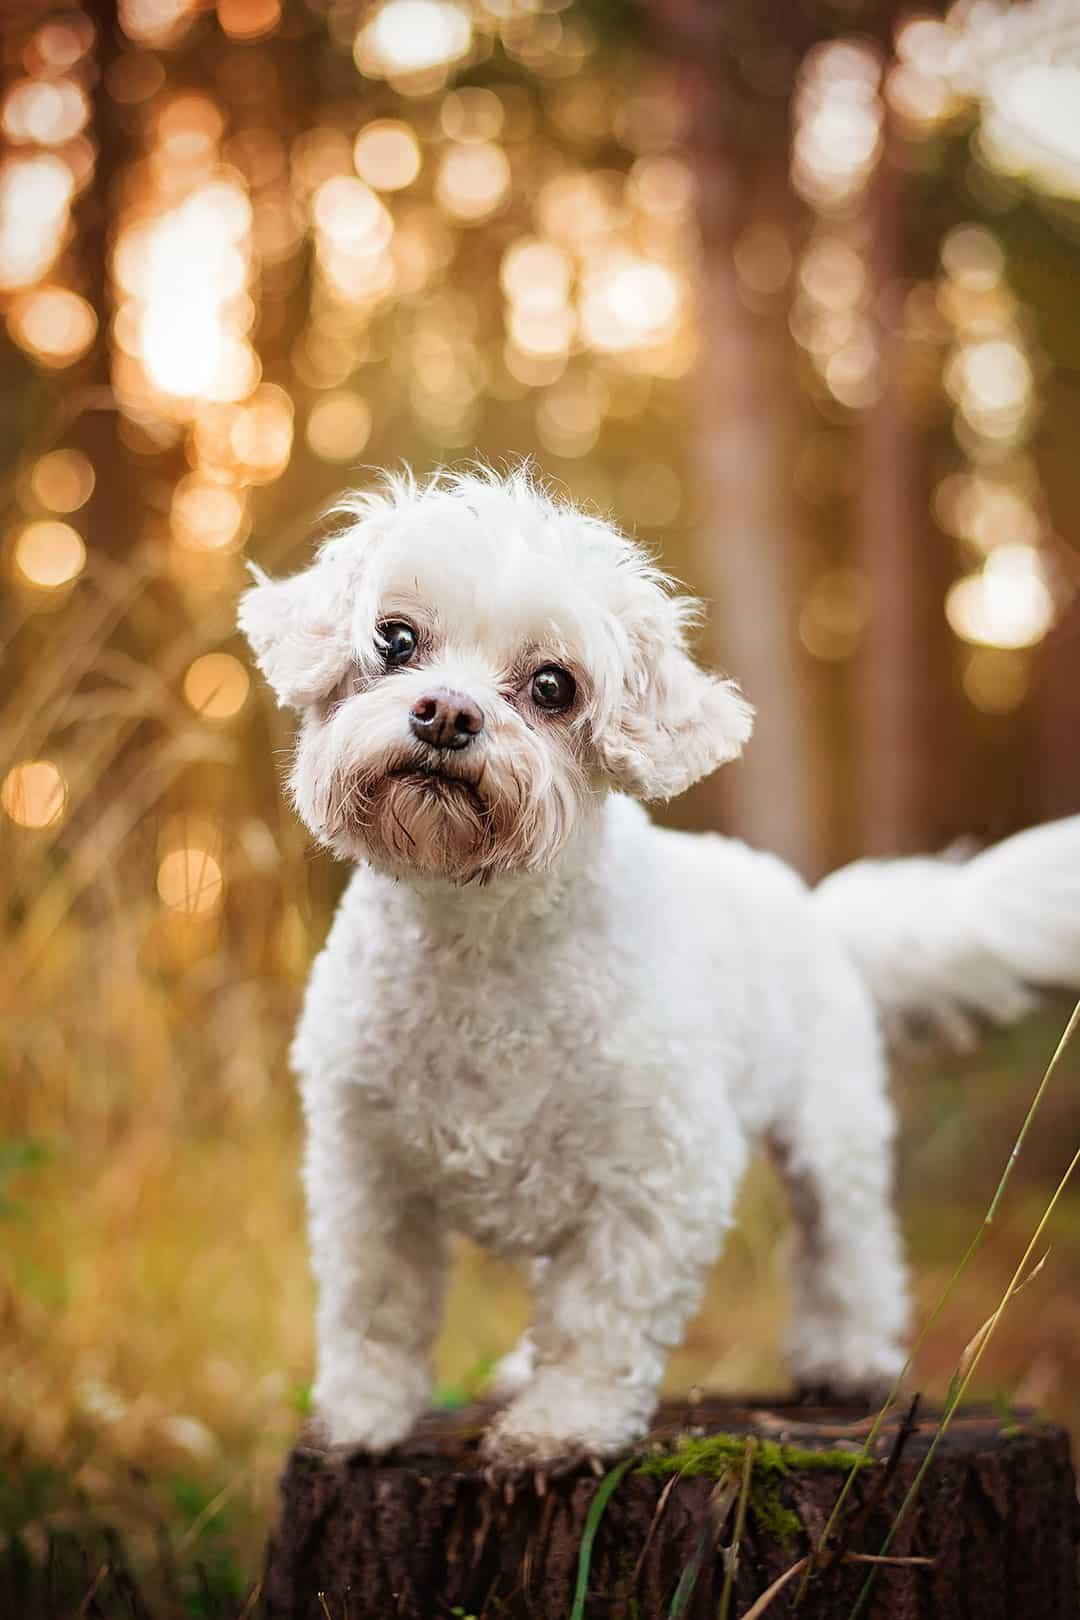 small white dog on tree stump